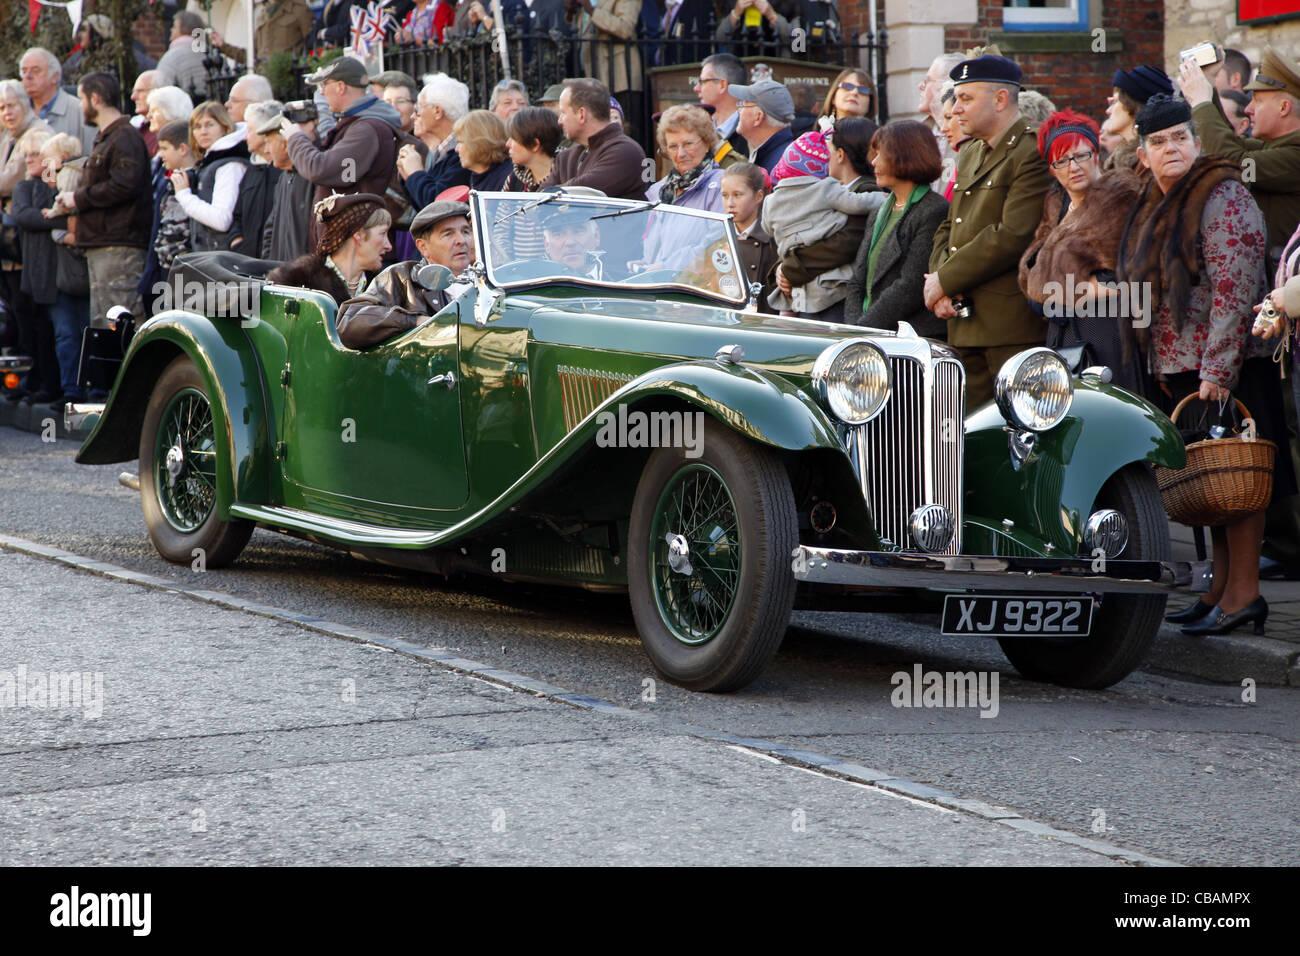 1933 SSI JAGUAR CAR PICKERING NORTH YORKSHIRE 15 October 2011 - Stock Image